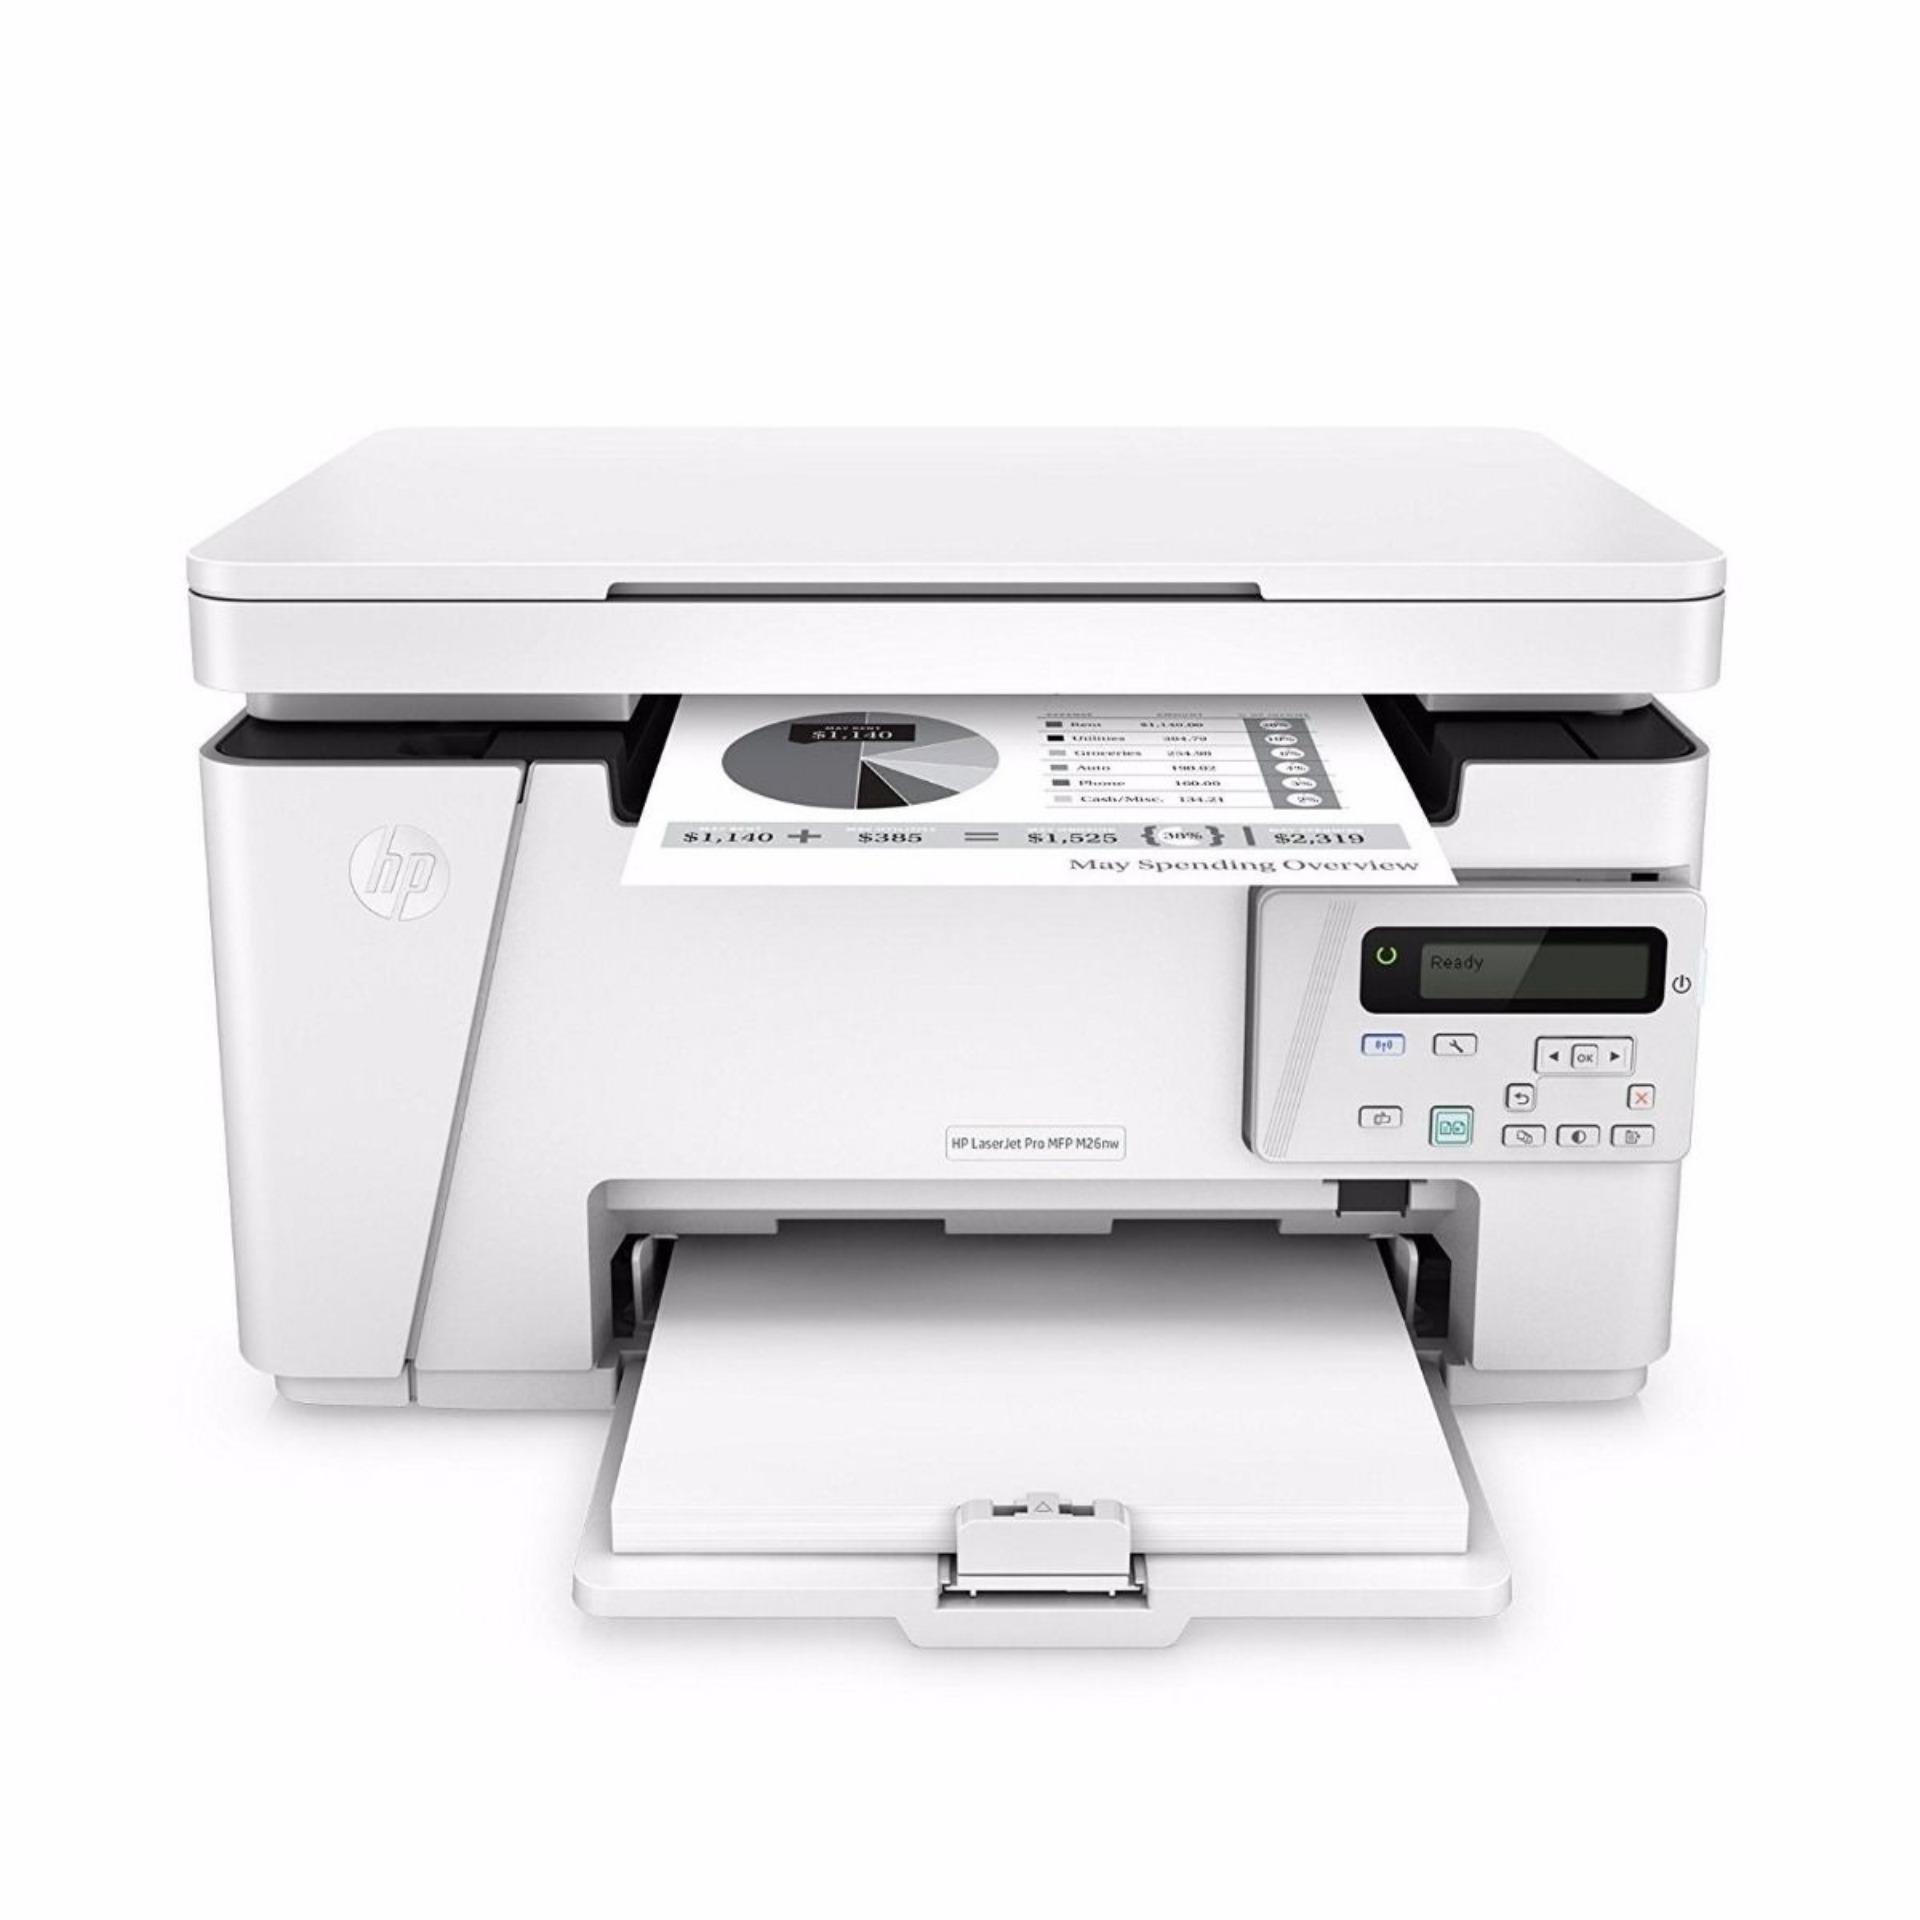 HP LaserJet Pro MFP M26a - Multifunction Laser Printer